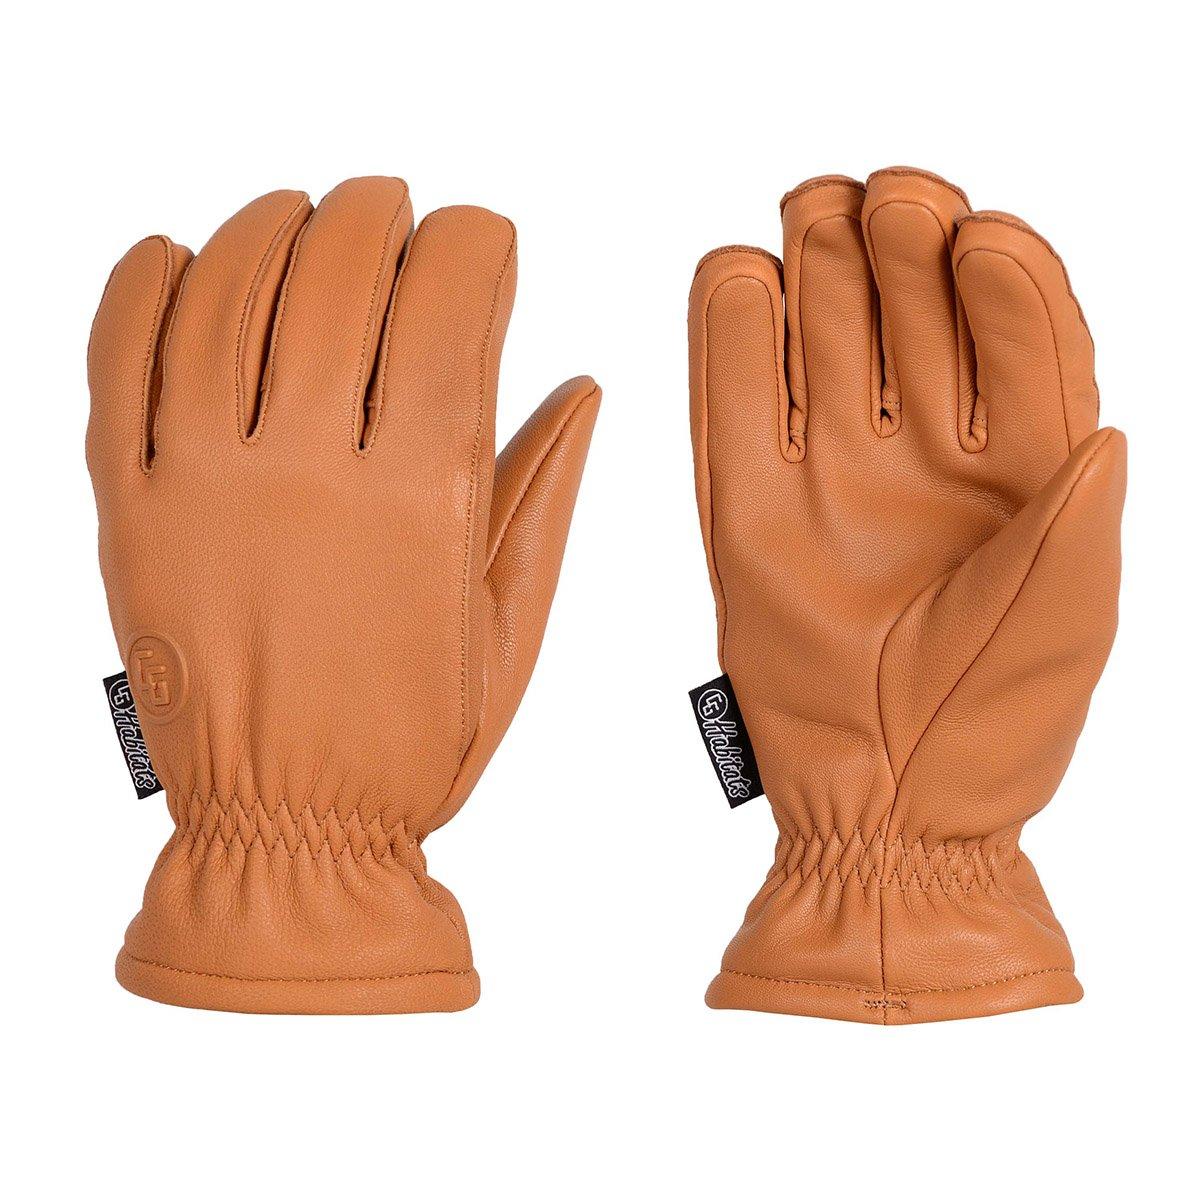 CG Habitats Game Changer Gloves